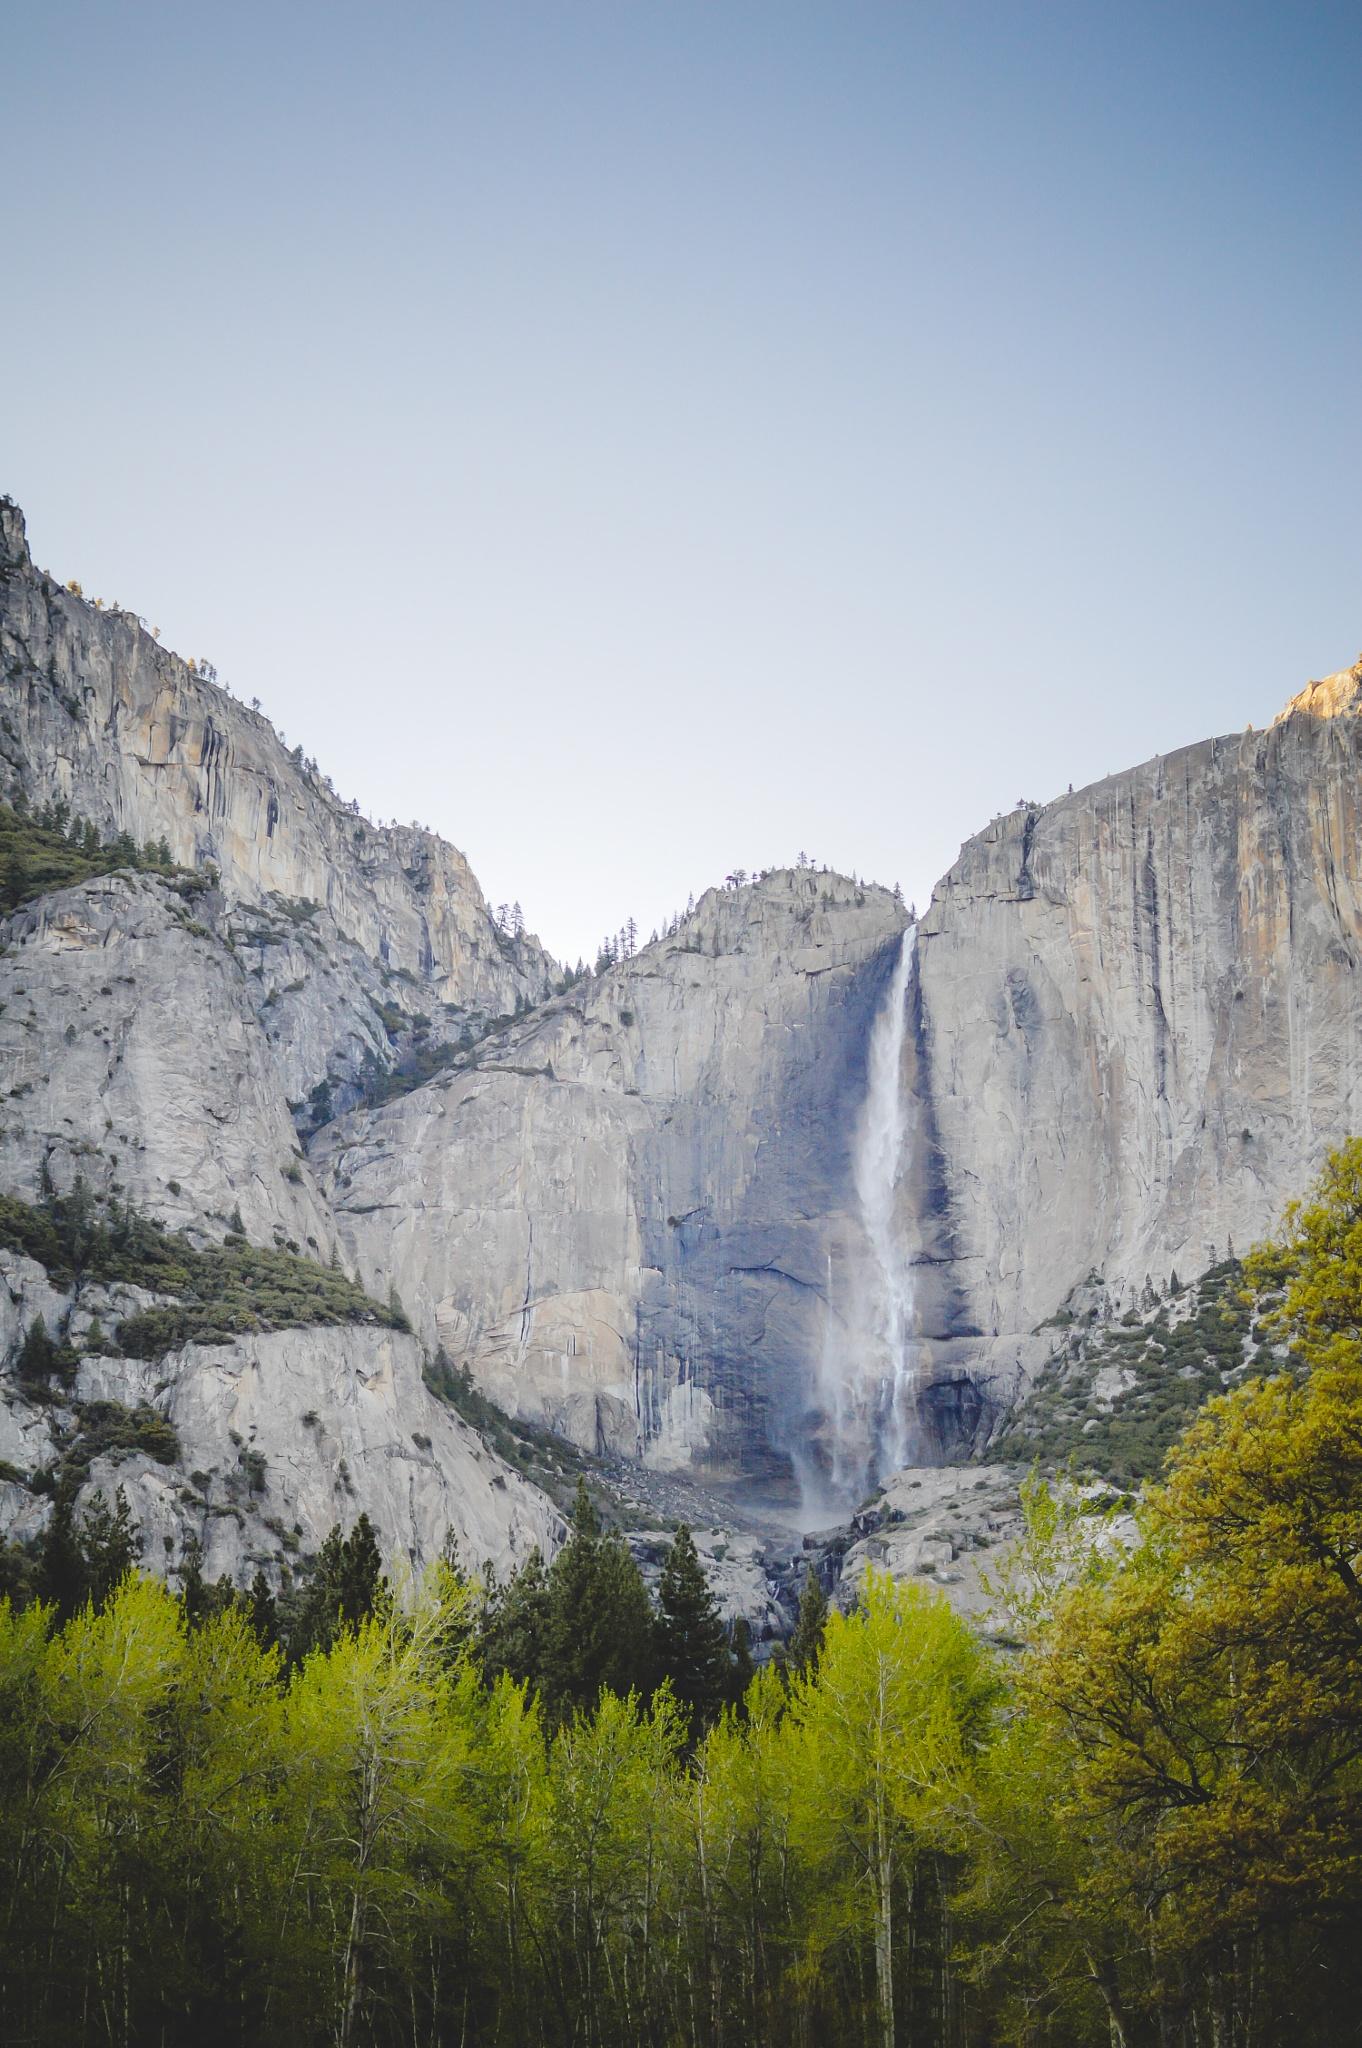 Yosemite by CruzinCalifornia